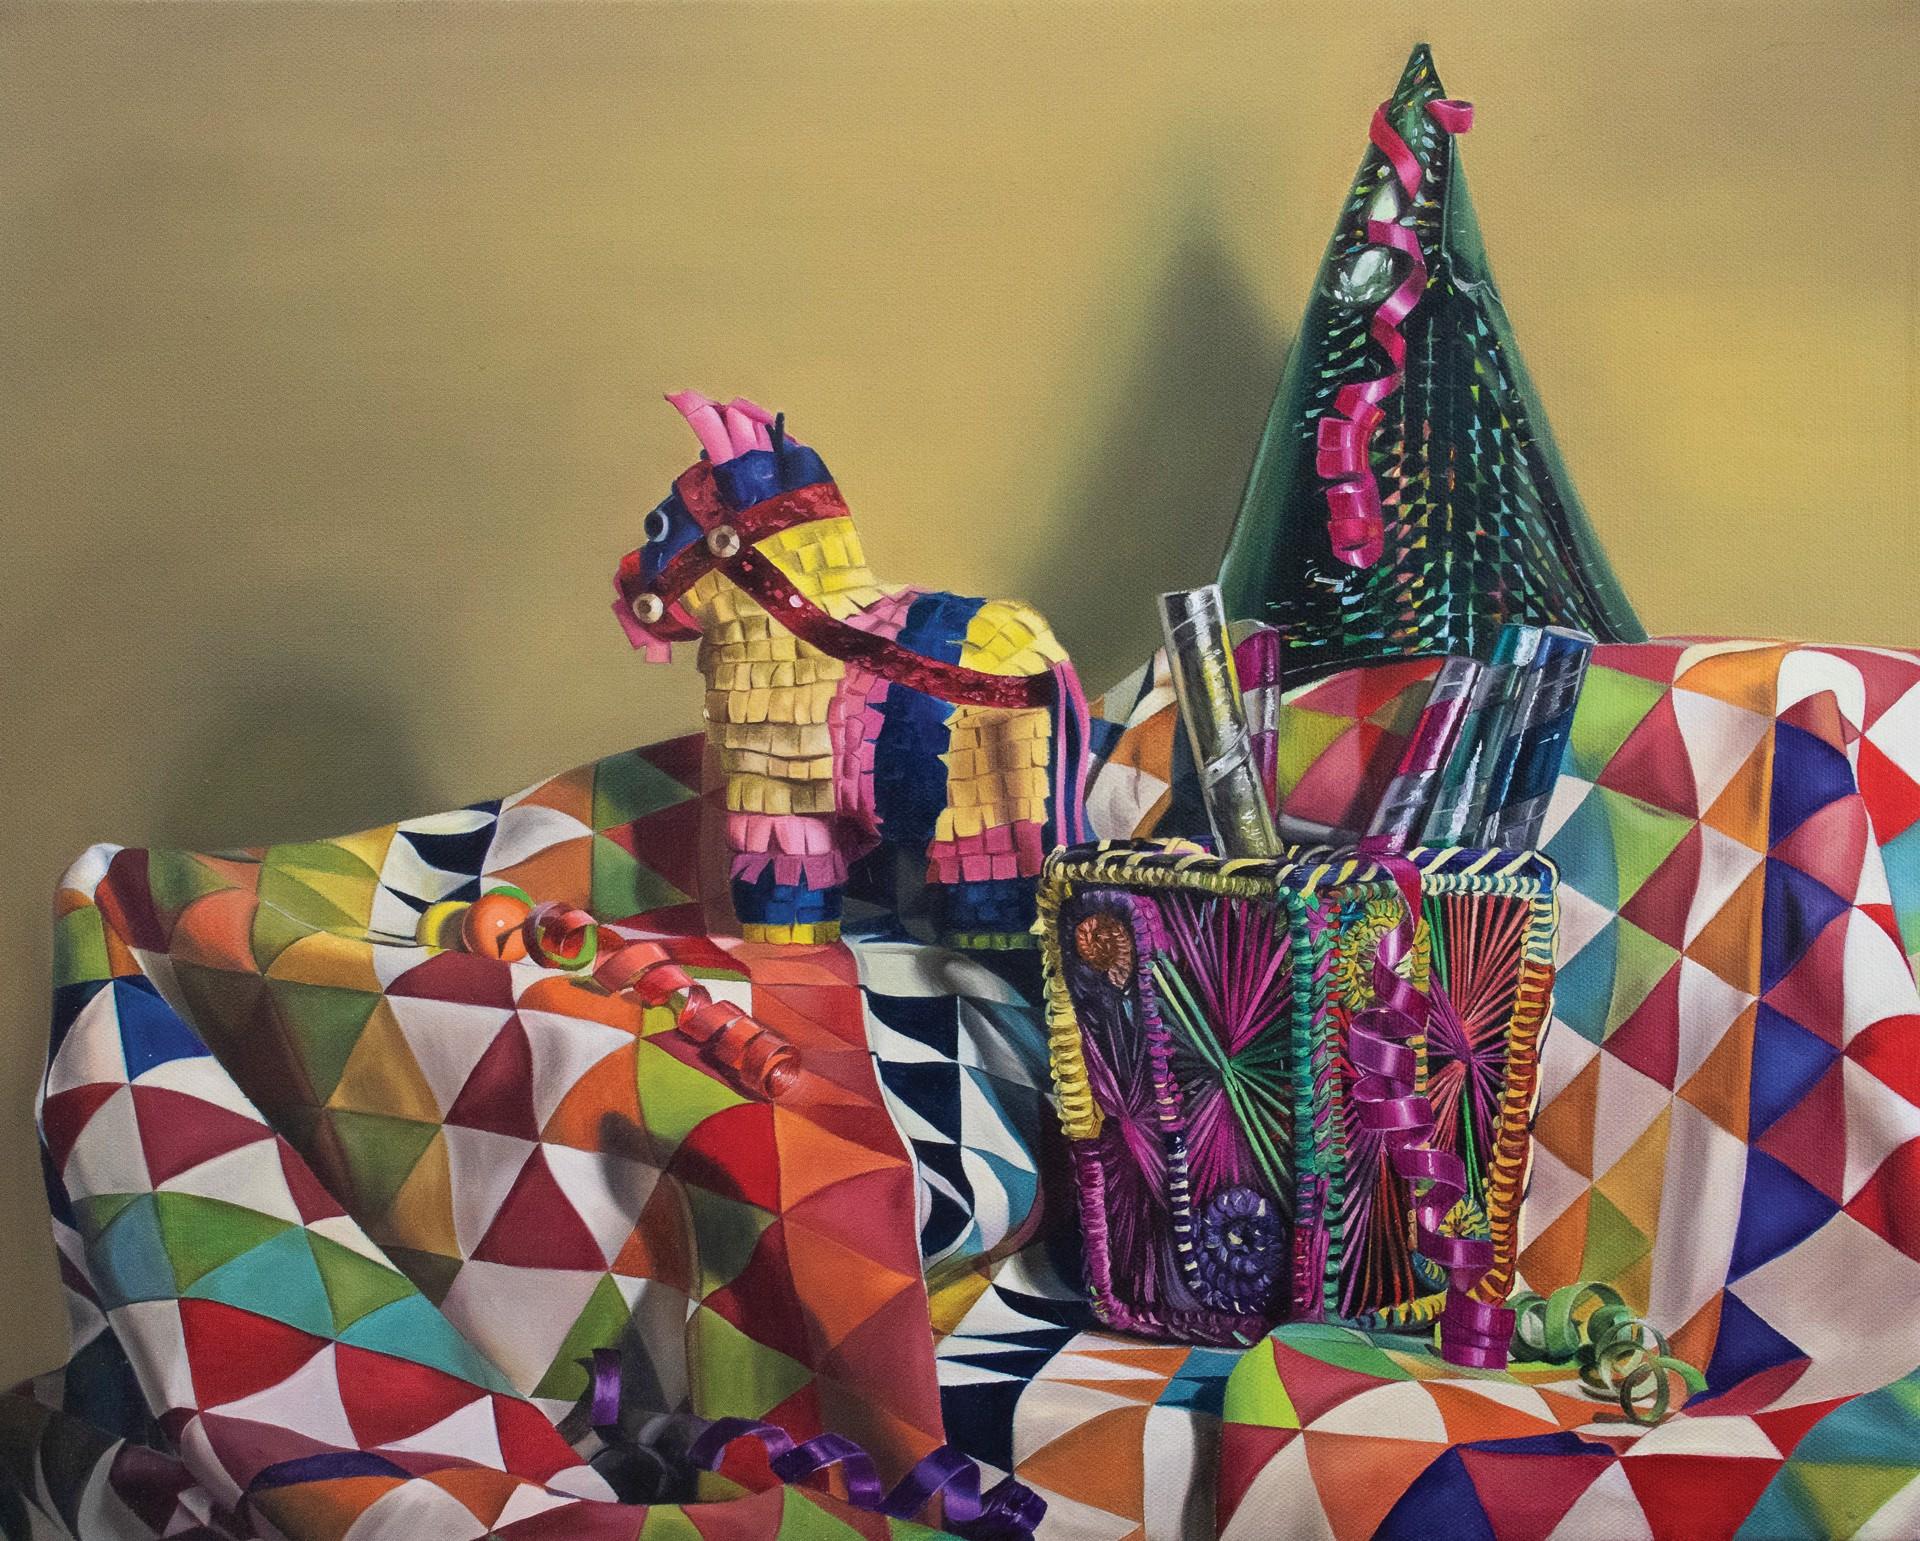 Piñata by Daniela Velez